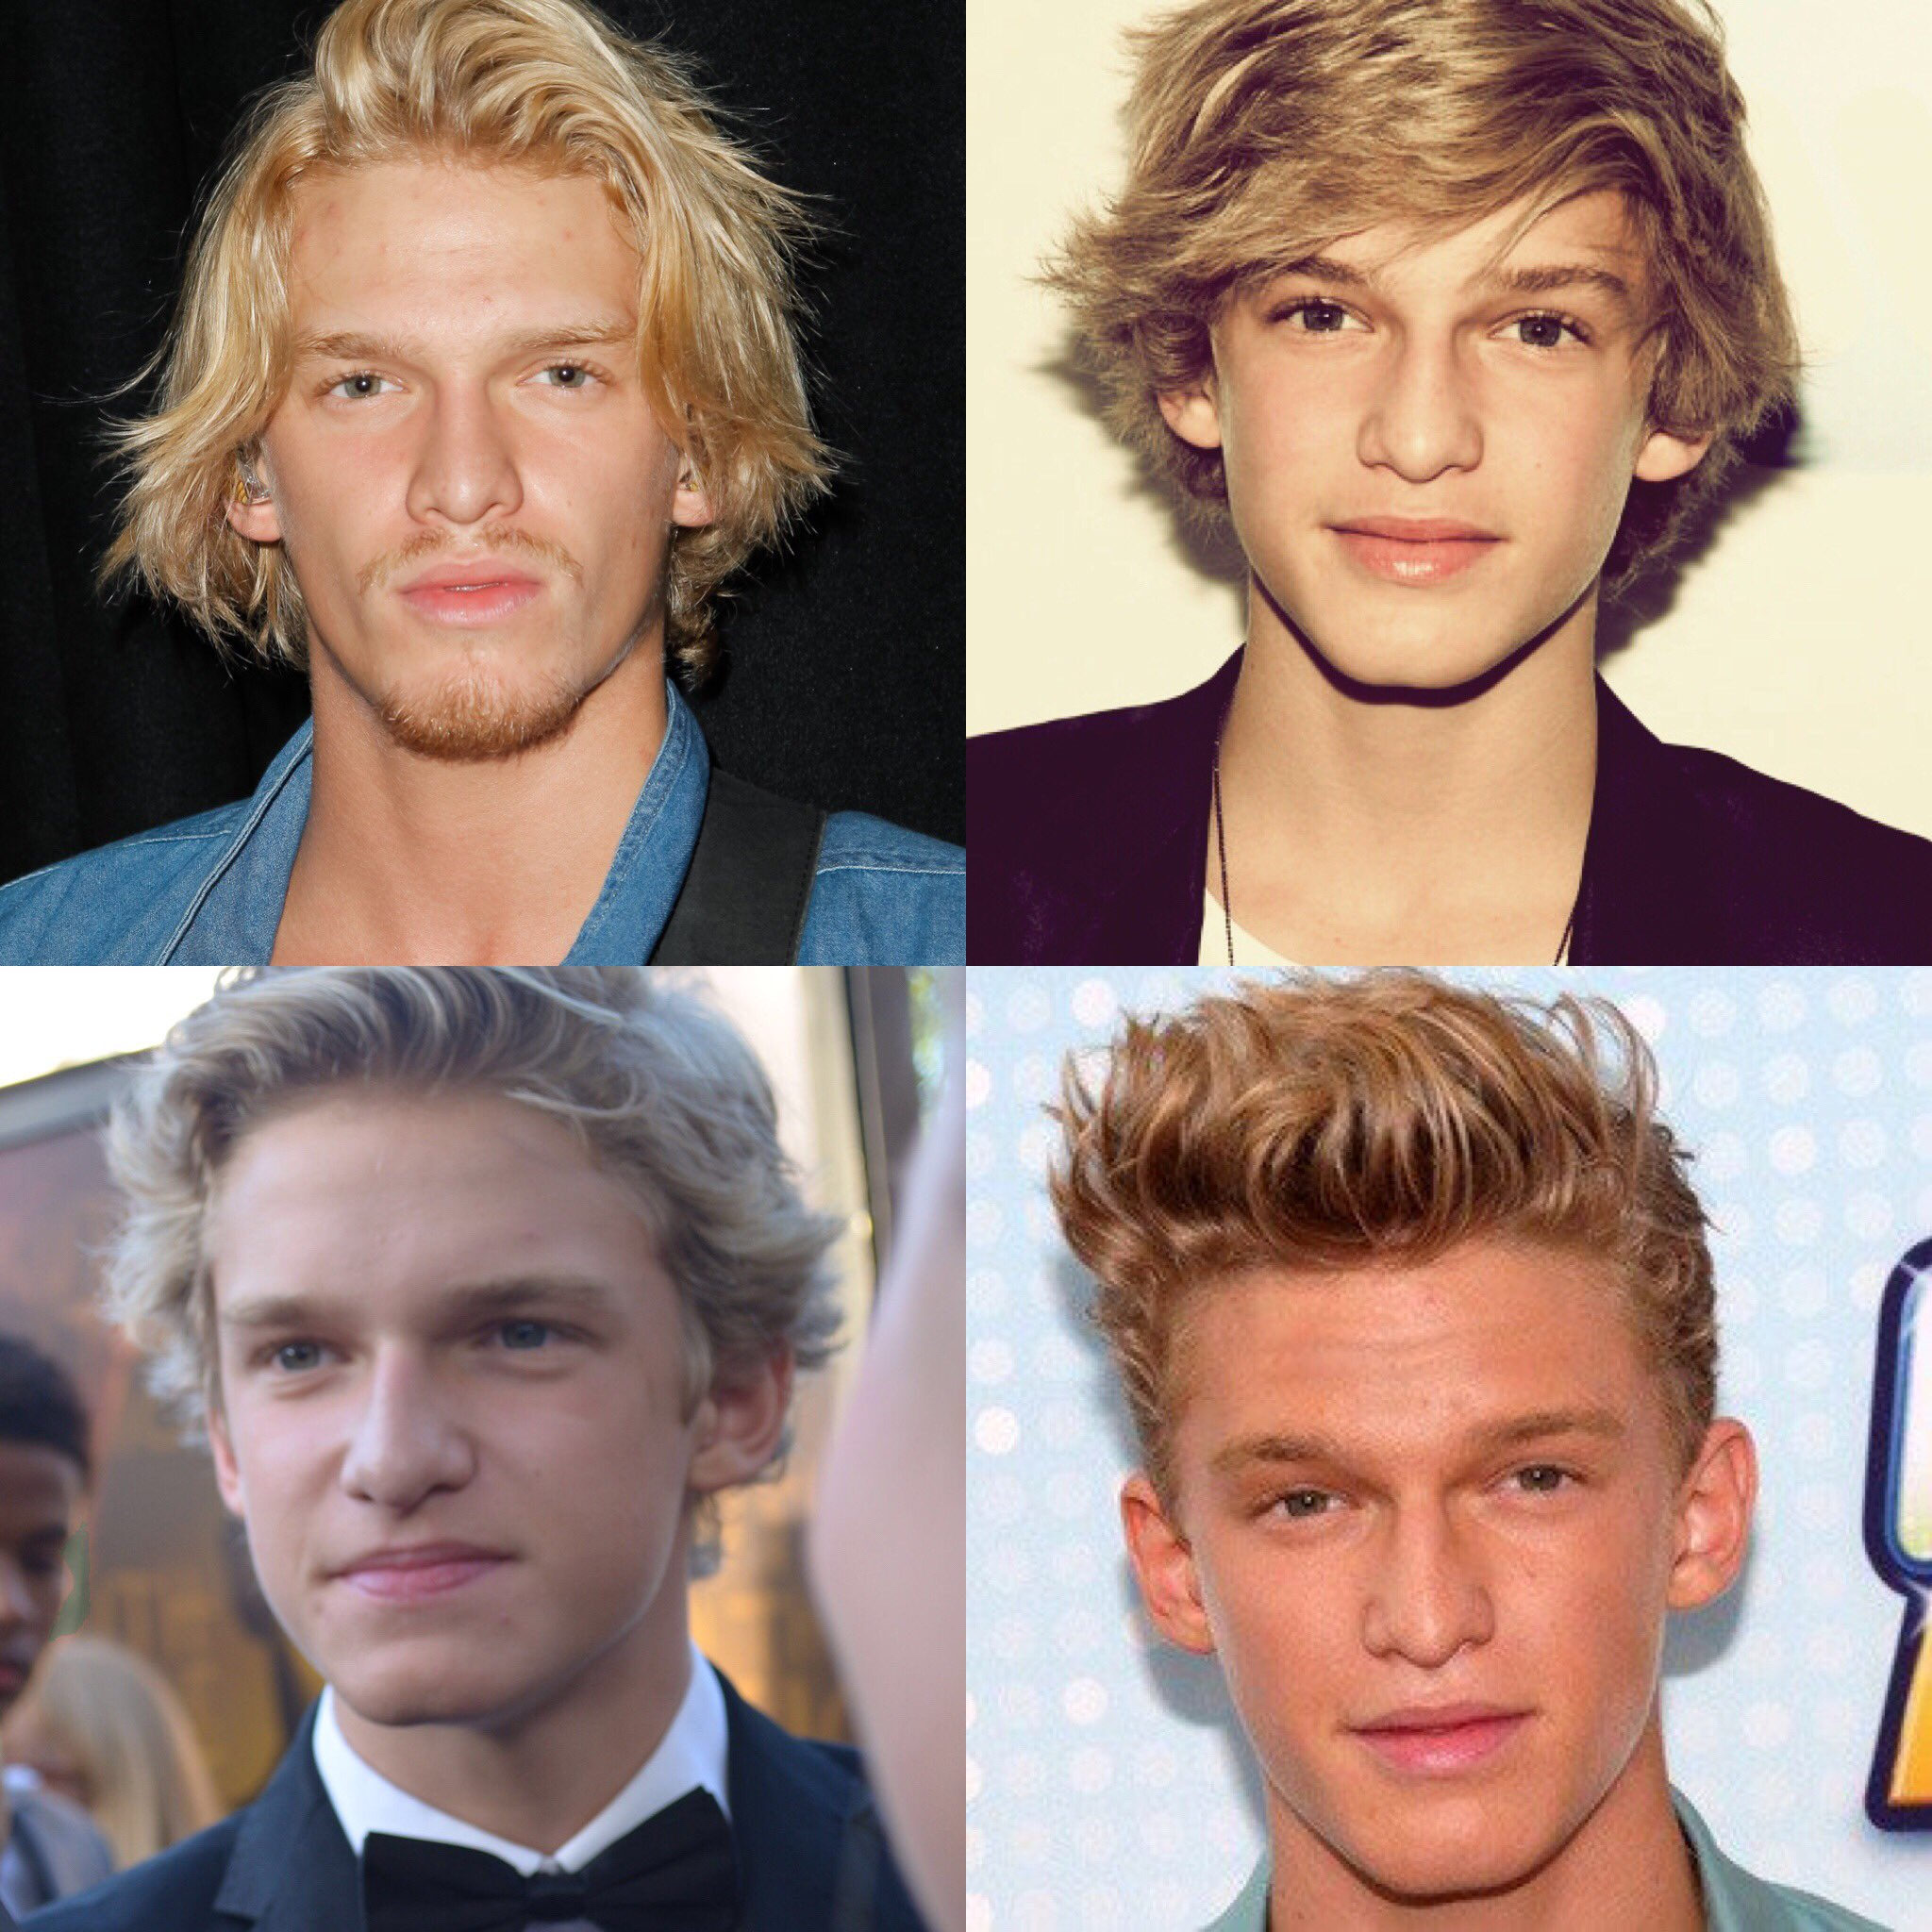 Happy 21 birthday to Cody Simpson. Hope that he has a wonderful birthday.